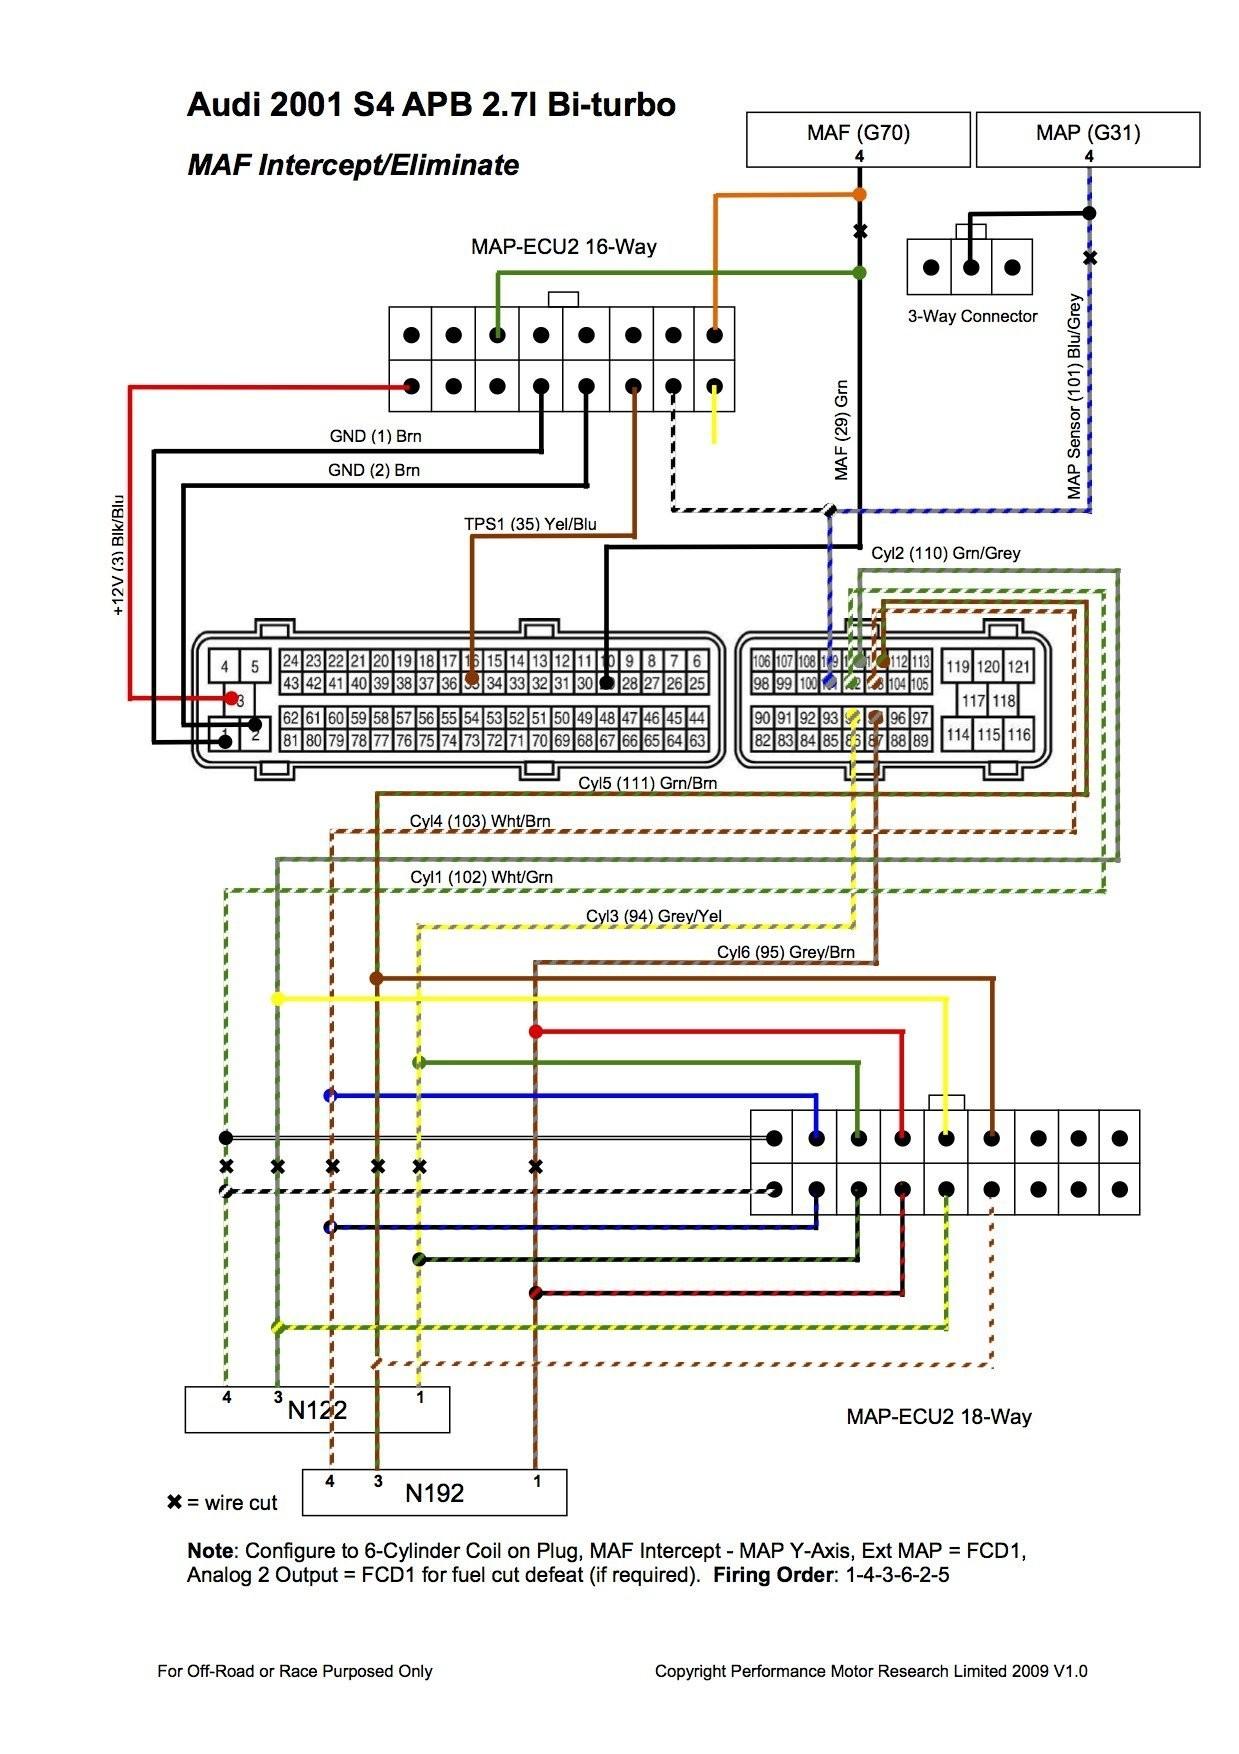 1999 Honda Accord Engine Diagram Part 82 Fabriquer Un Ilot De Cuisine Avec Meuble Ikea Of 1999 Honda Accord Engine Diagram